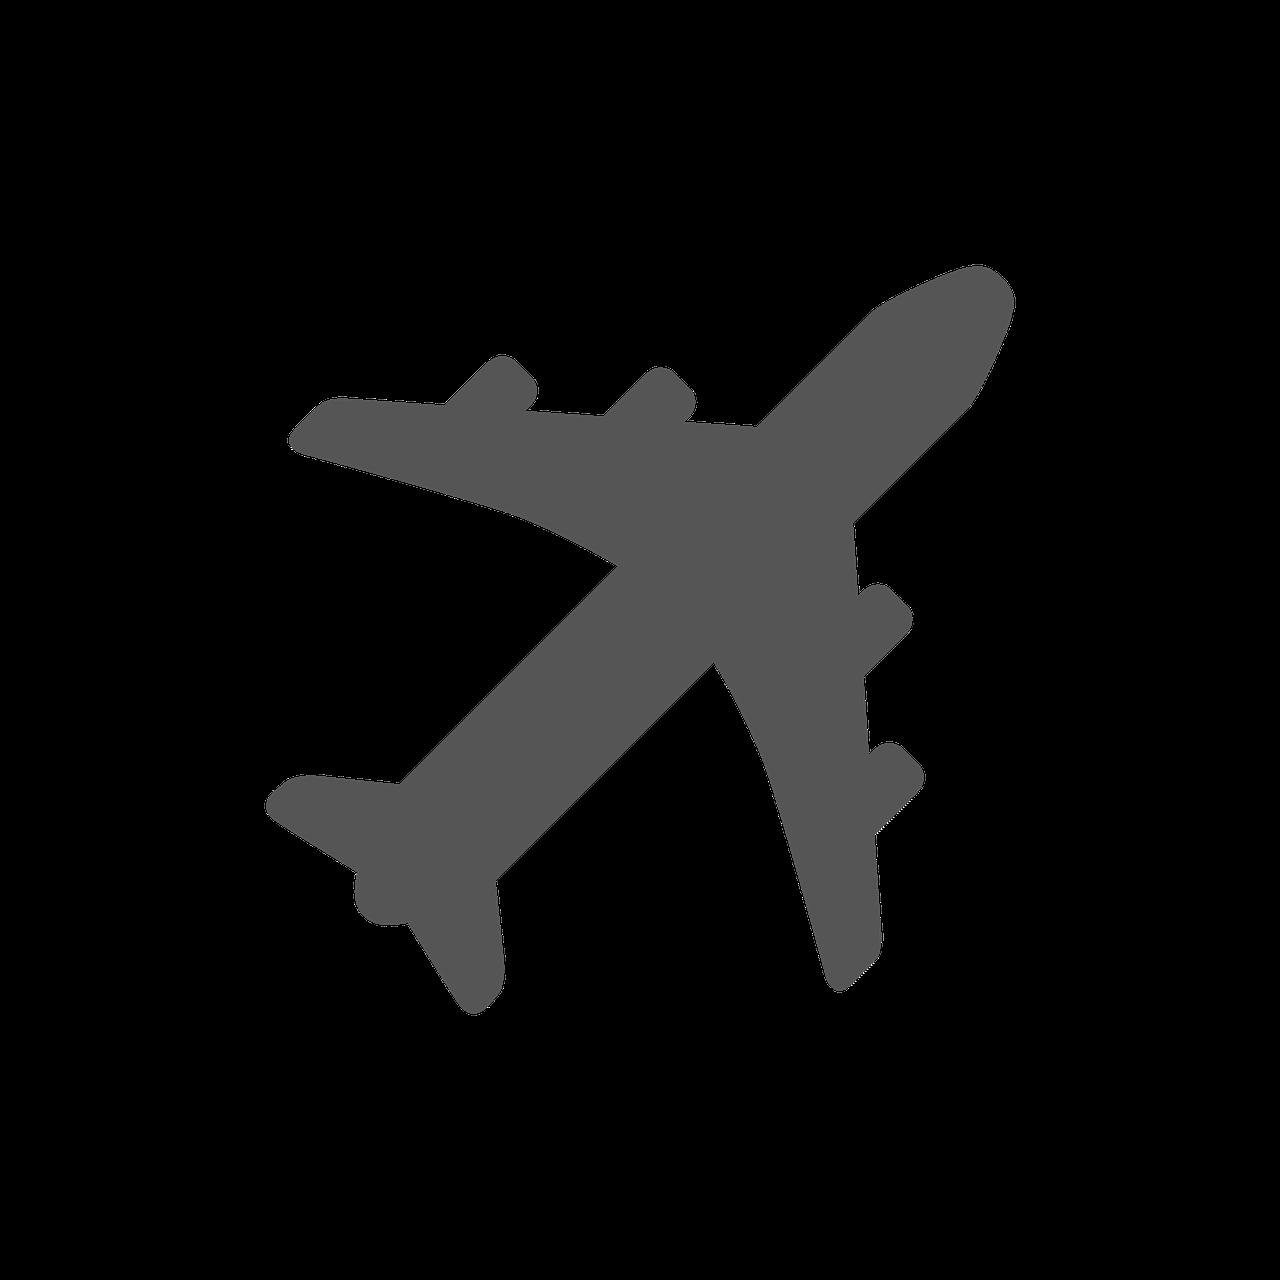 icon, symbol, flat